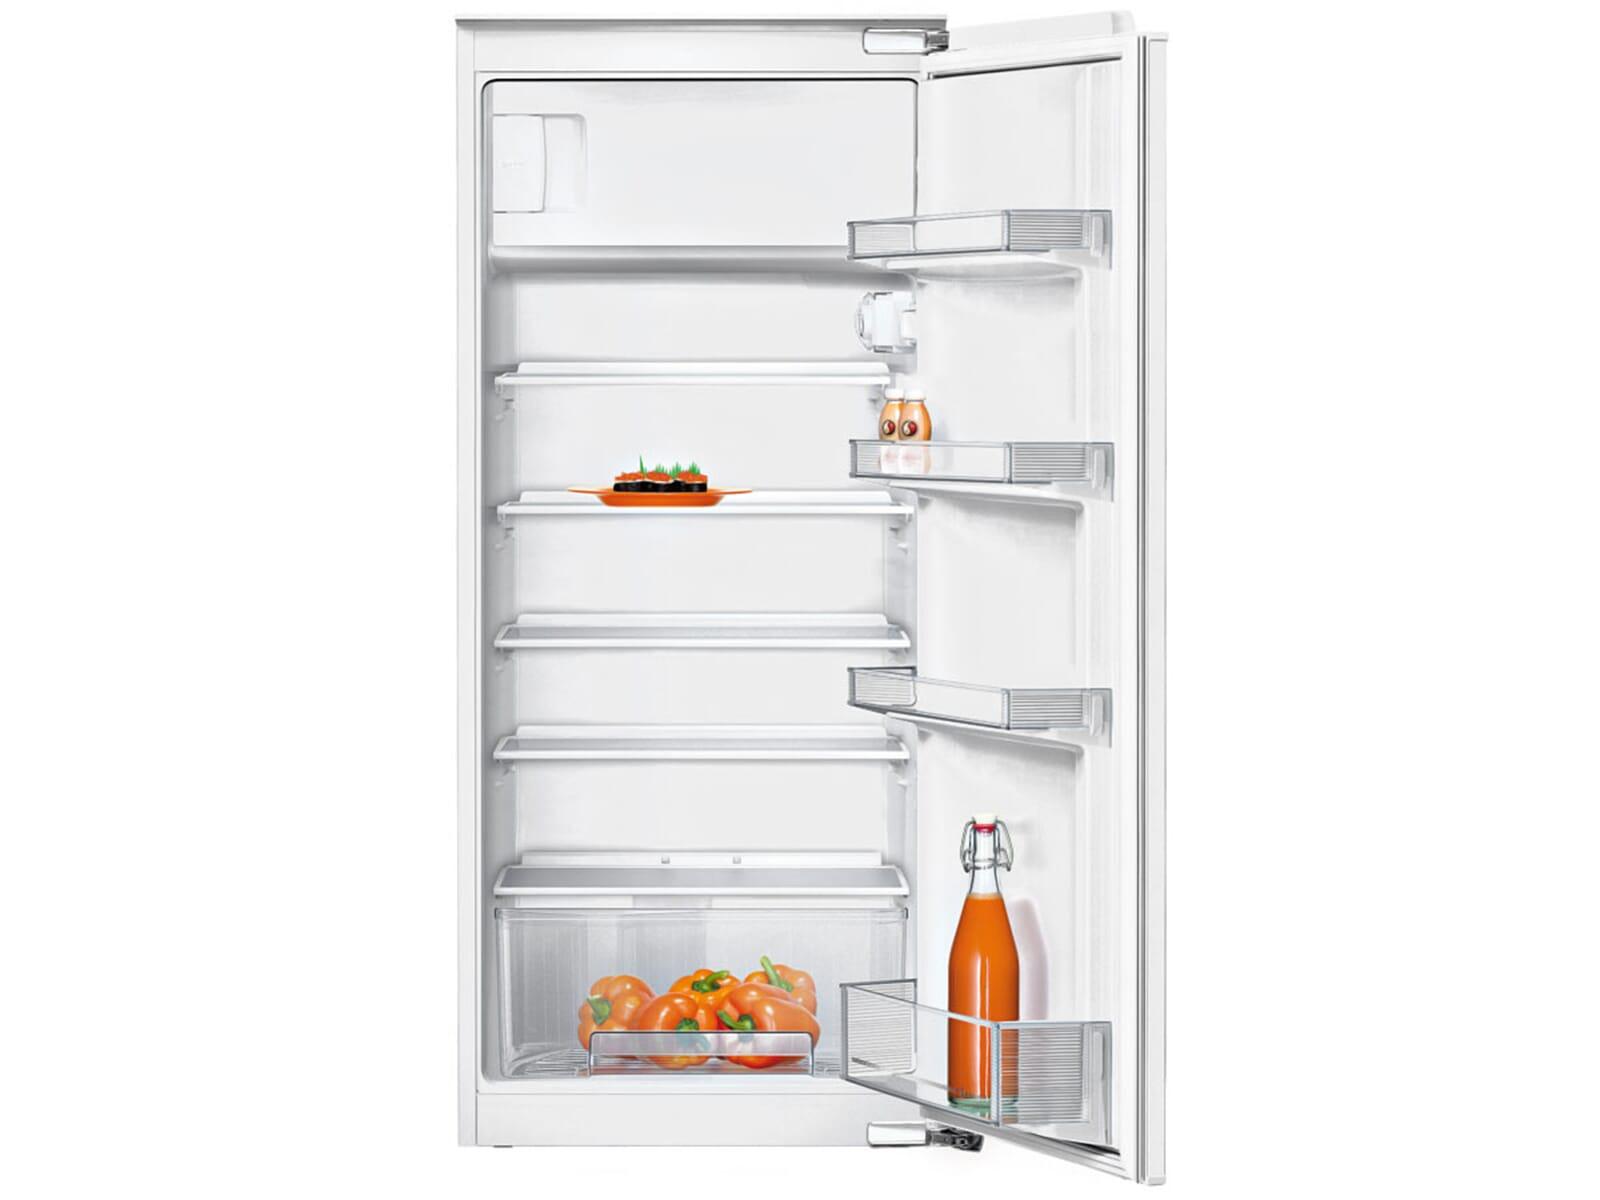 Neff K 425 A1 Einbaukühlschrank